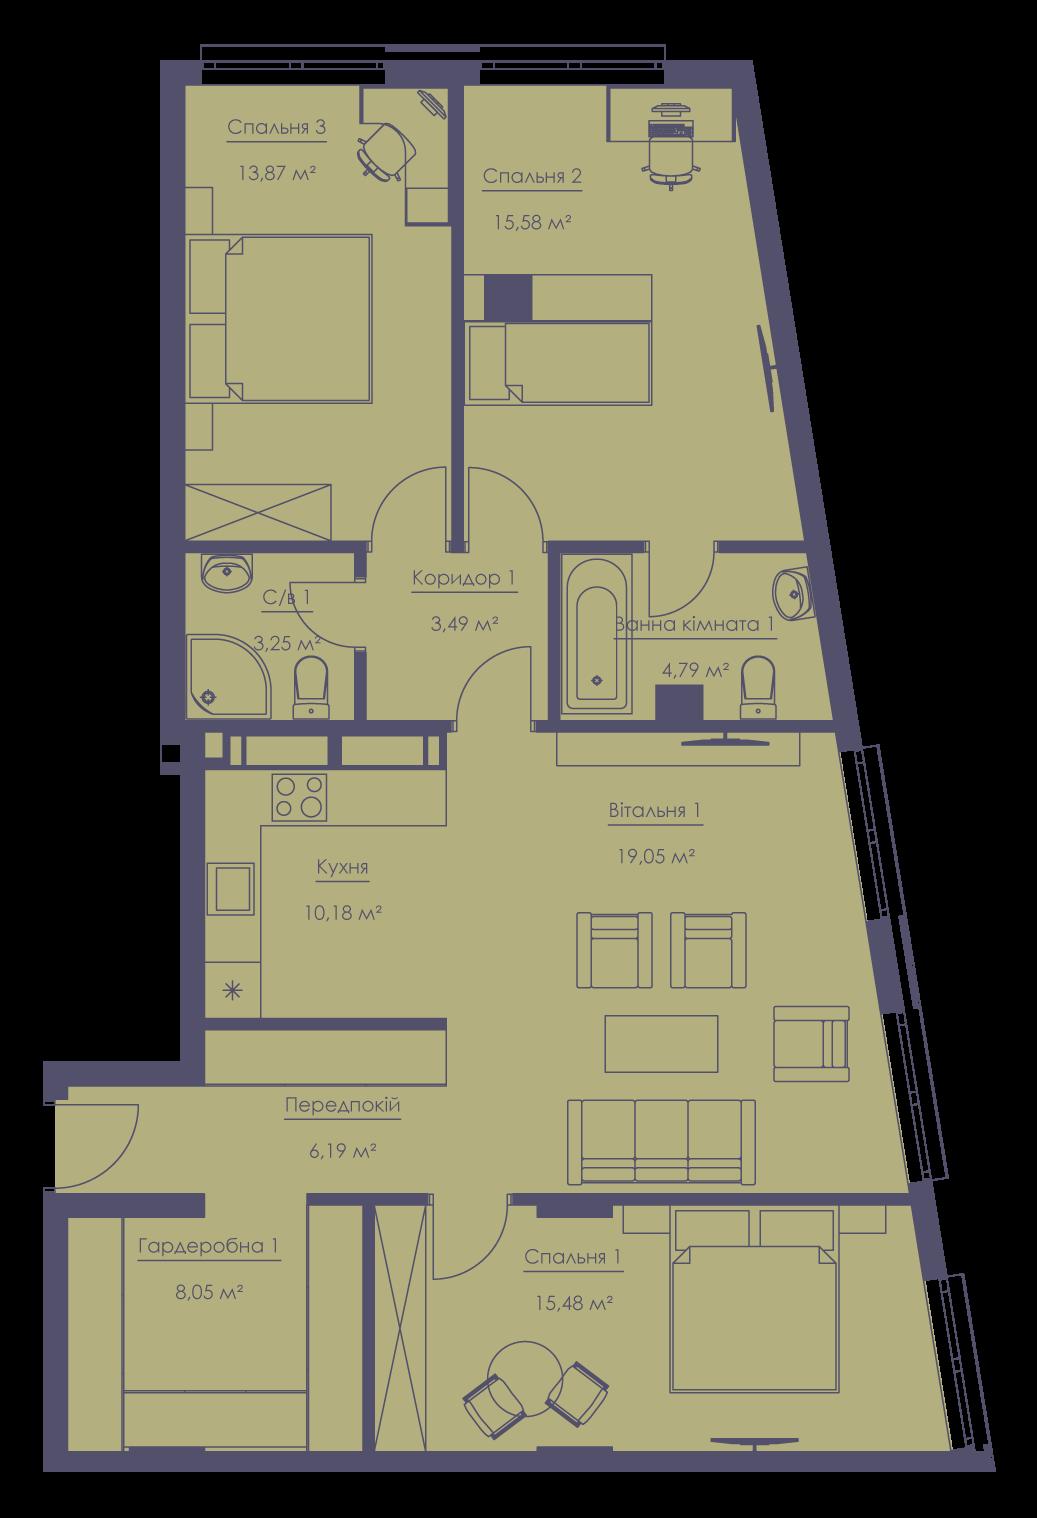 Apartment layout KV_47_4g_1_1_11-1